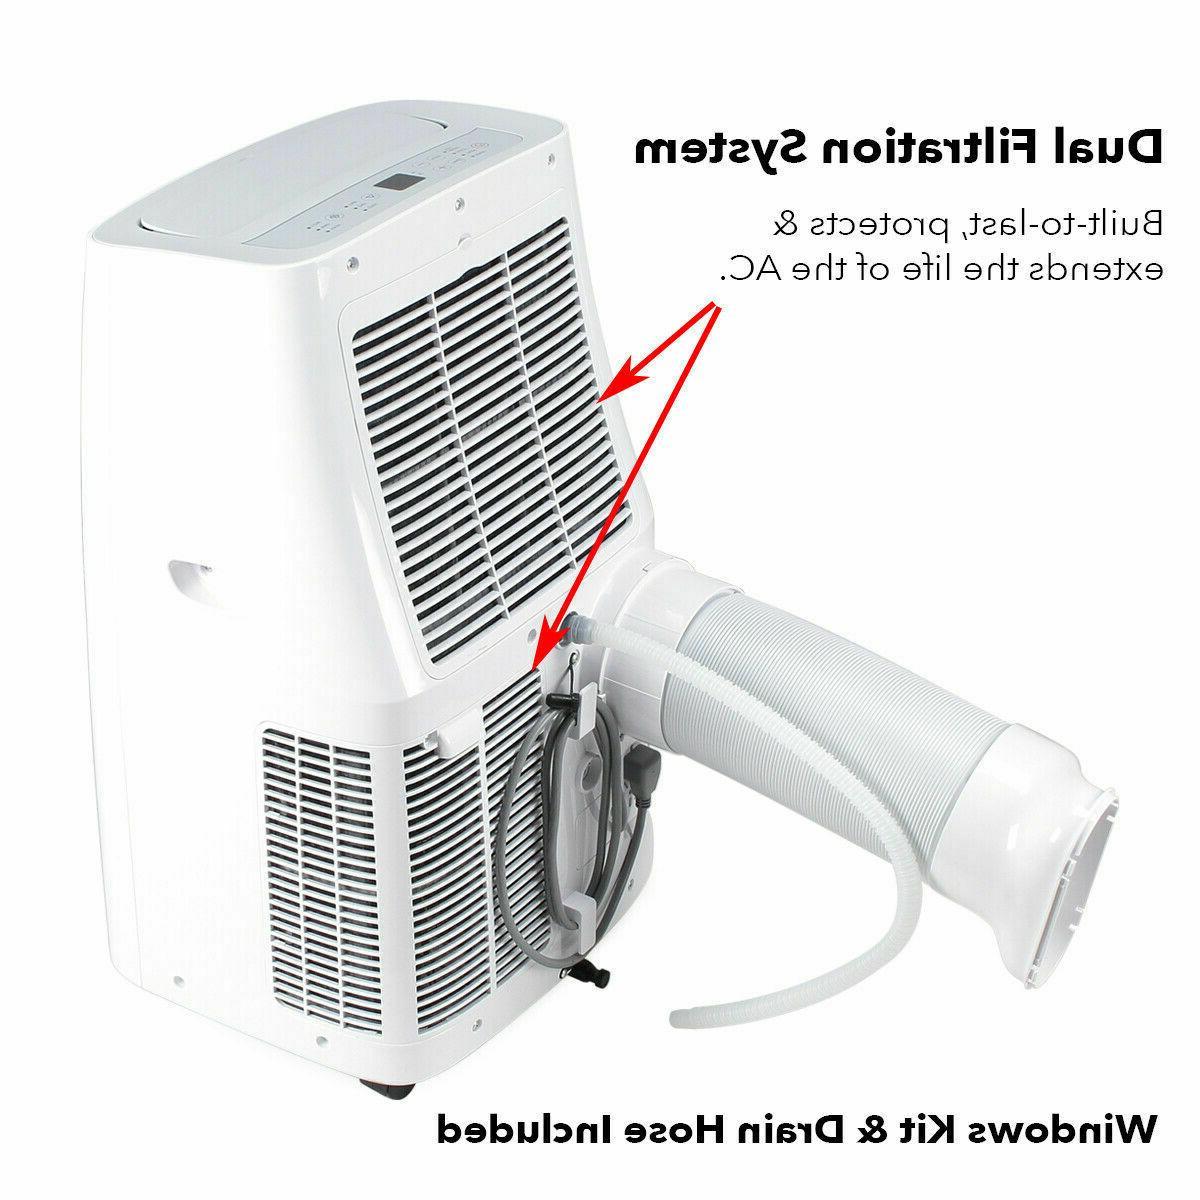 700 Air Conditioner 1050W Heater Pint Dehumidifier